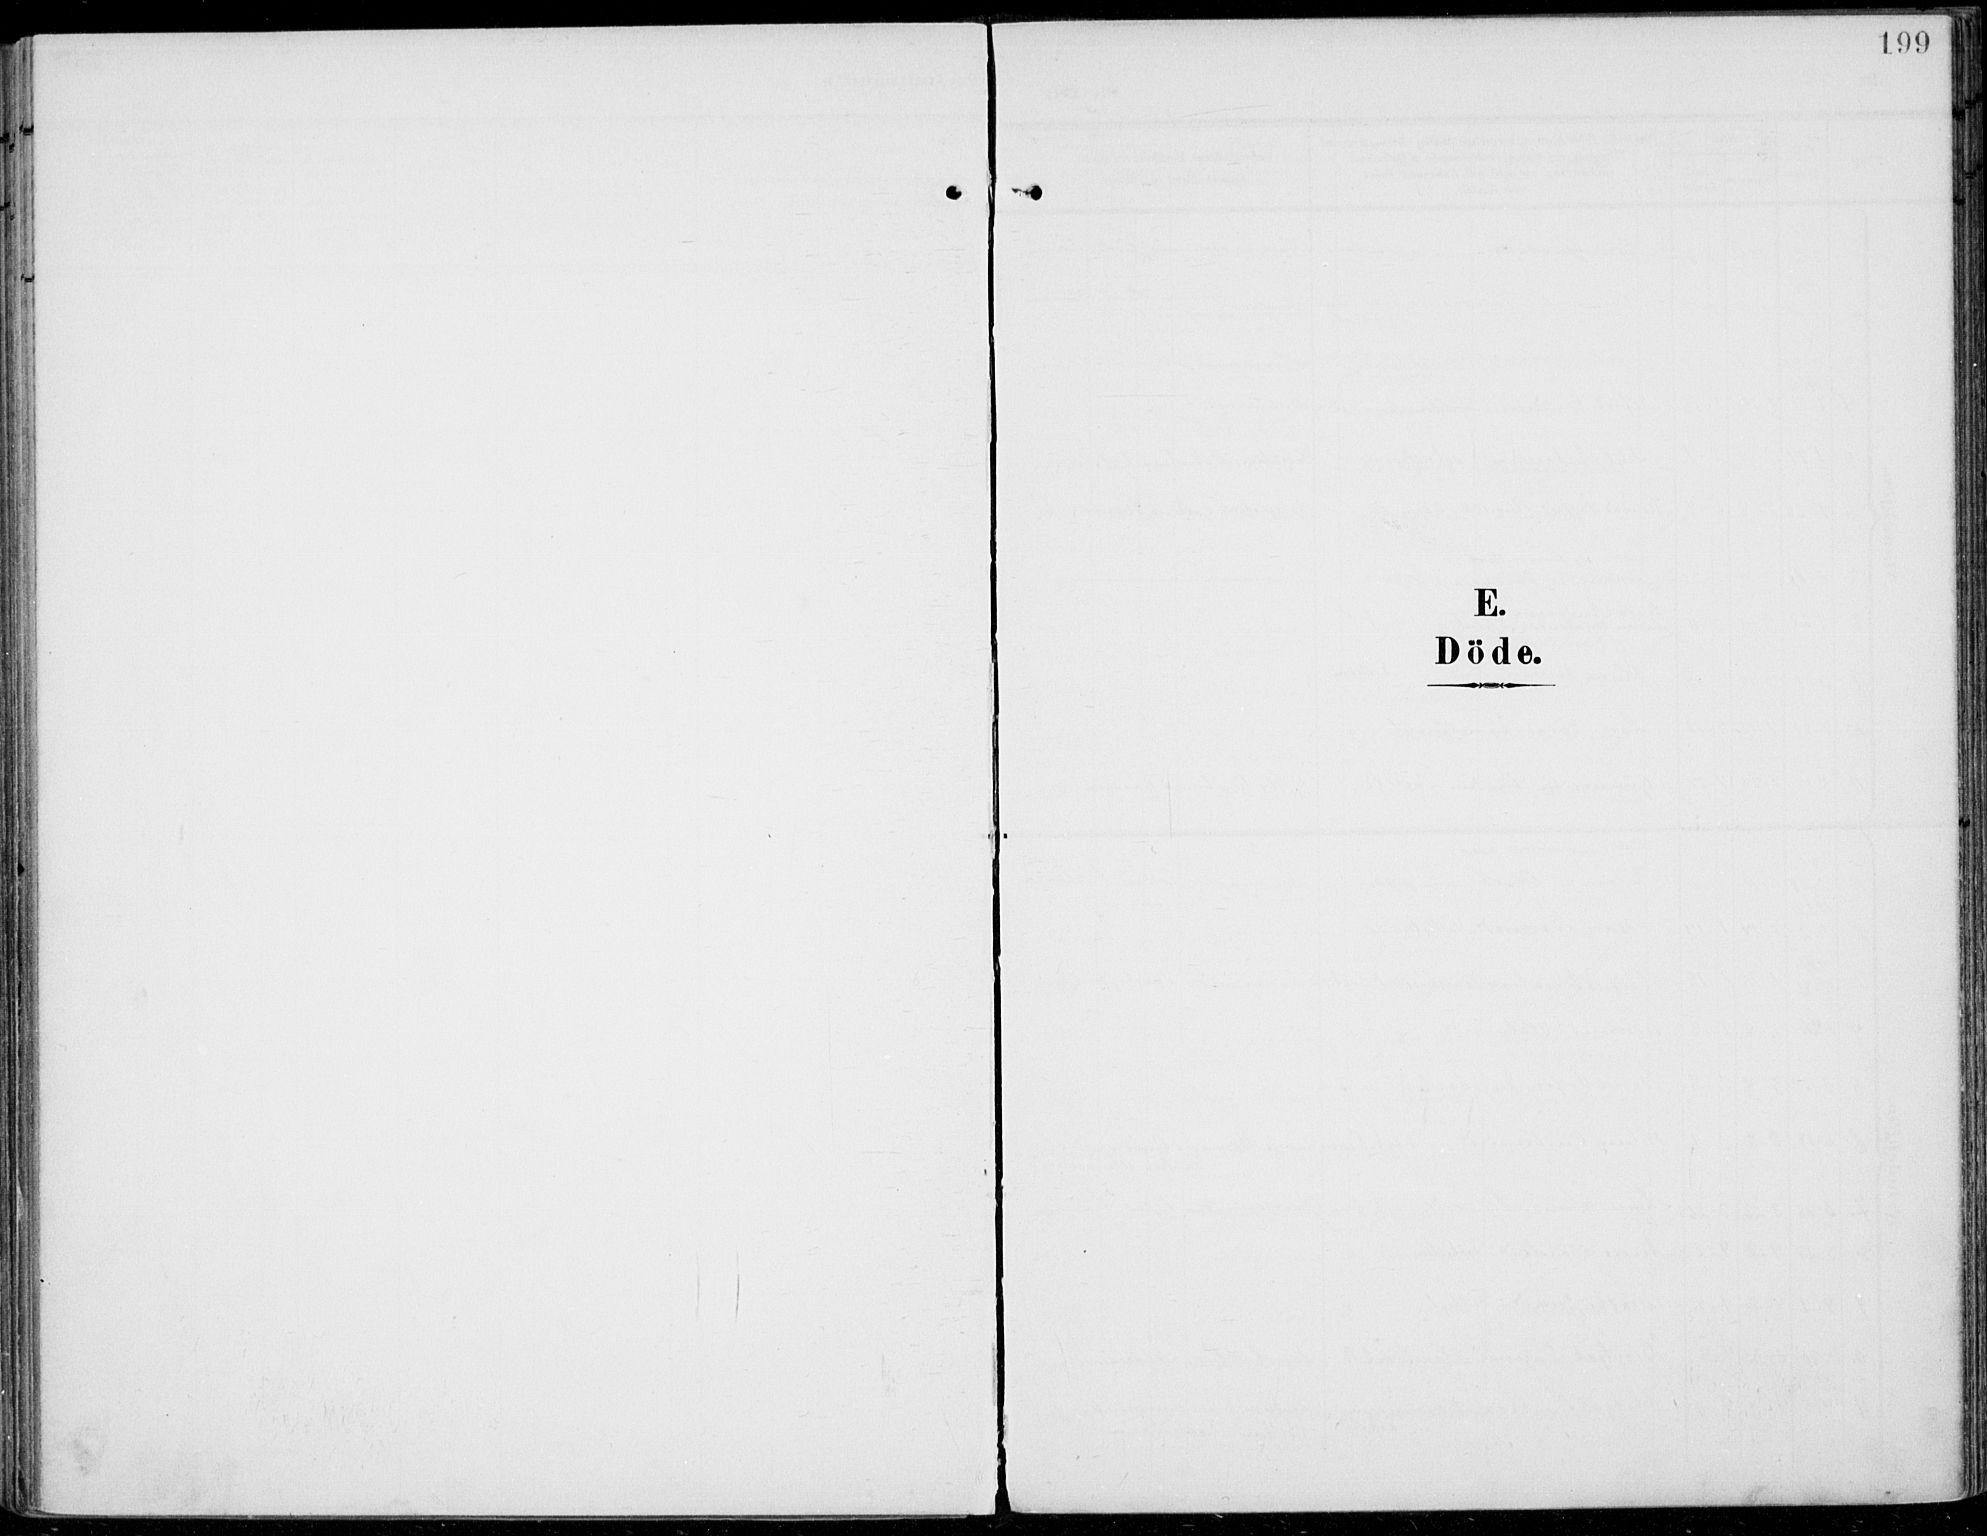 SAH, Jevnaker prestekontor, Ministerialbok nr. 11, 1902-1913, s. 199